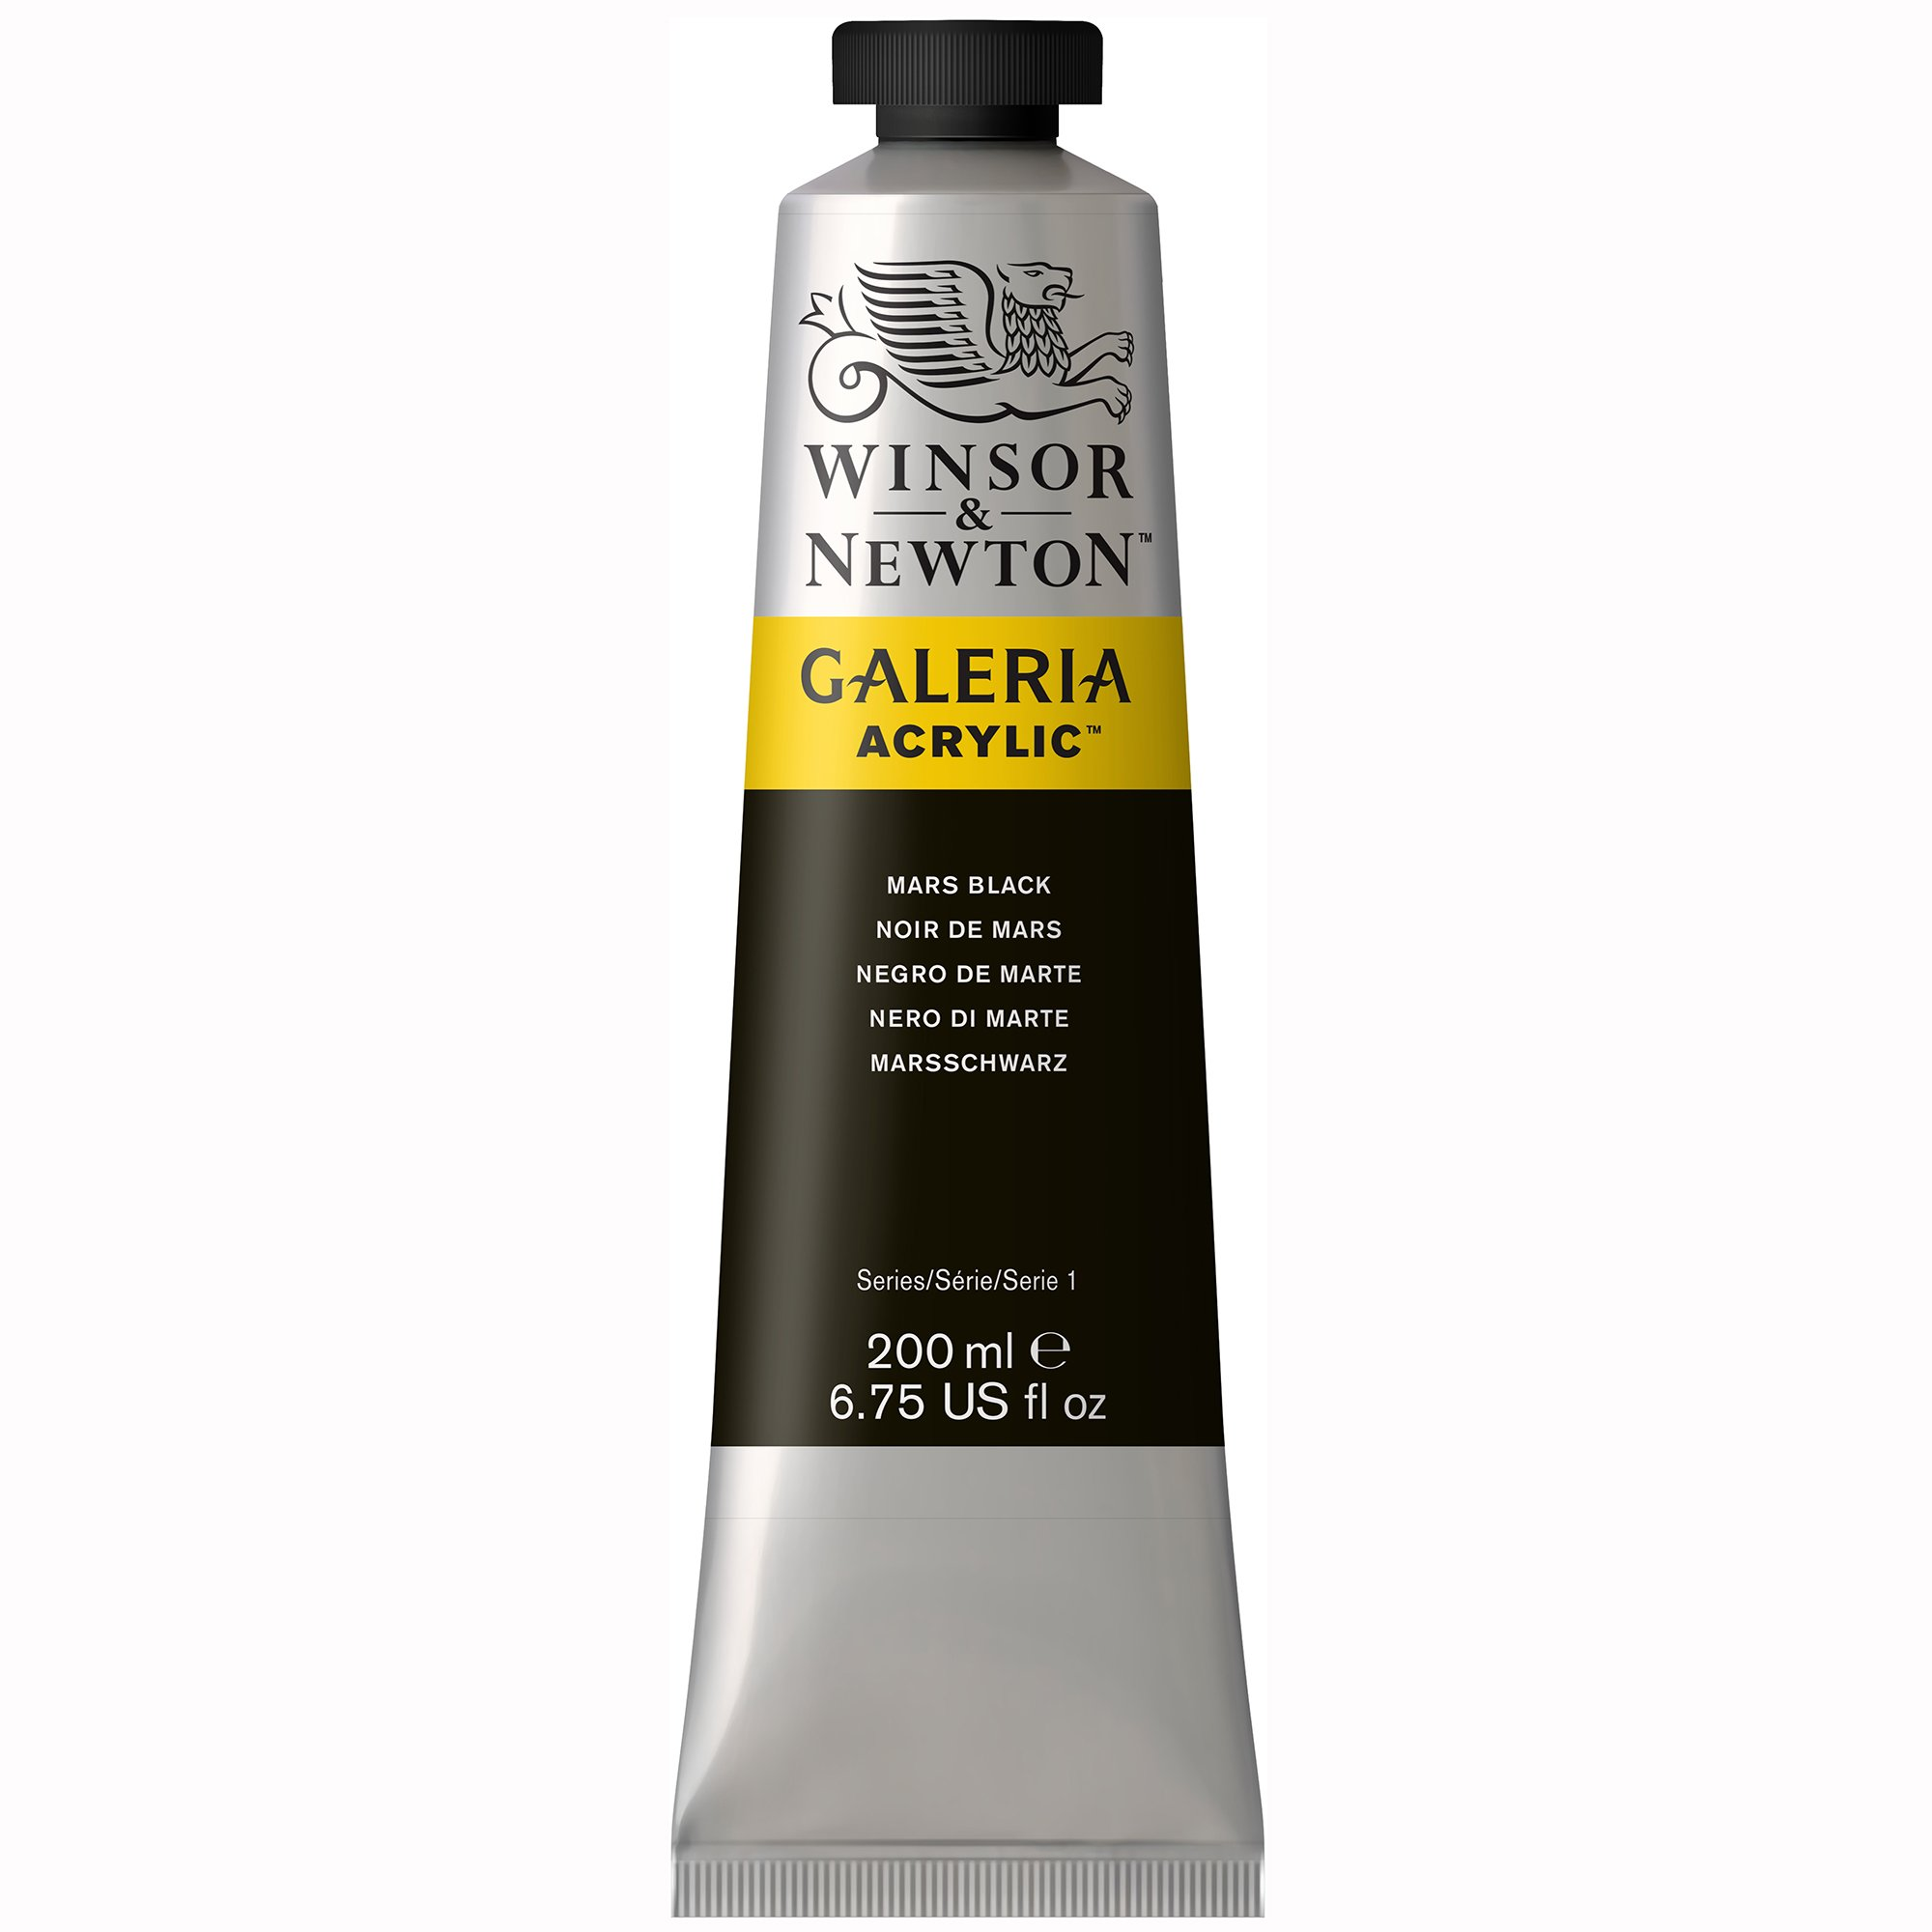 Winsor & Newton Galeria Acrylic Paint, 200ml tube, Mars Black